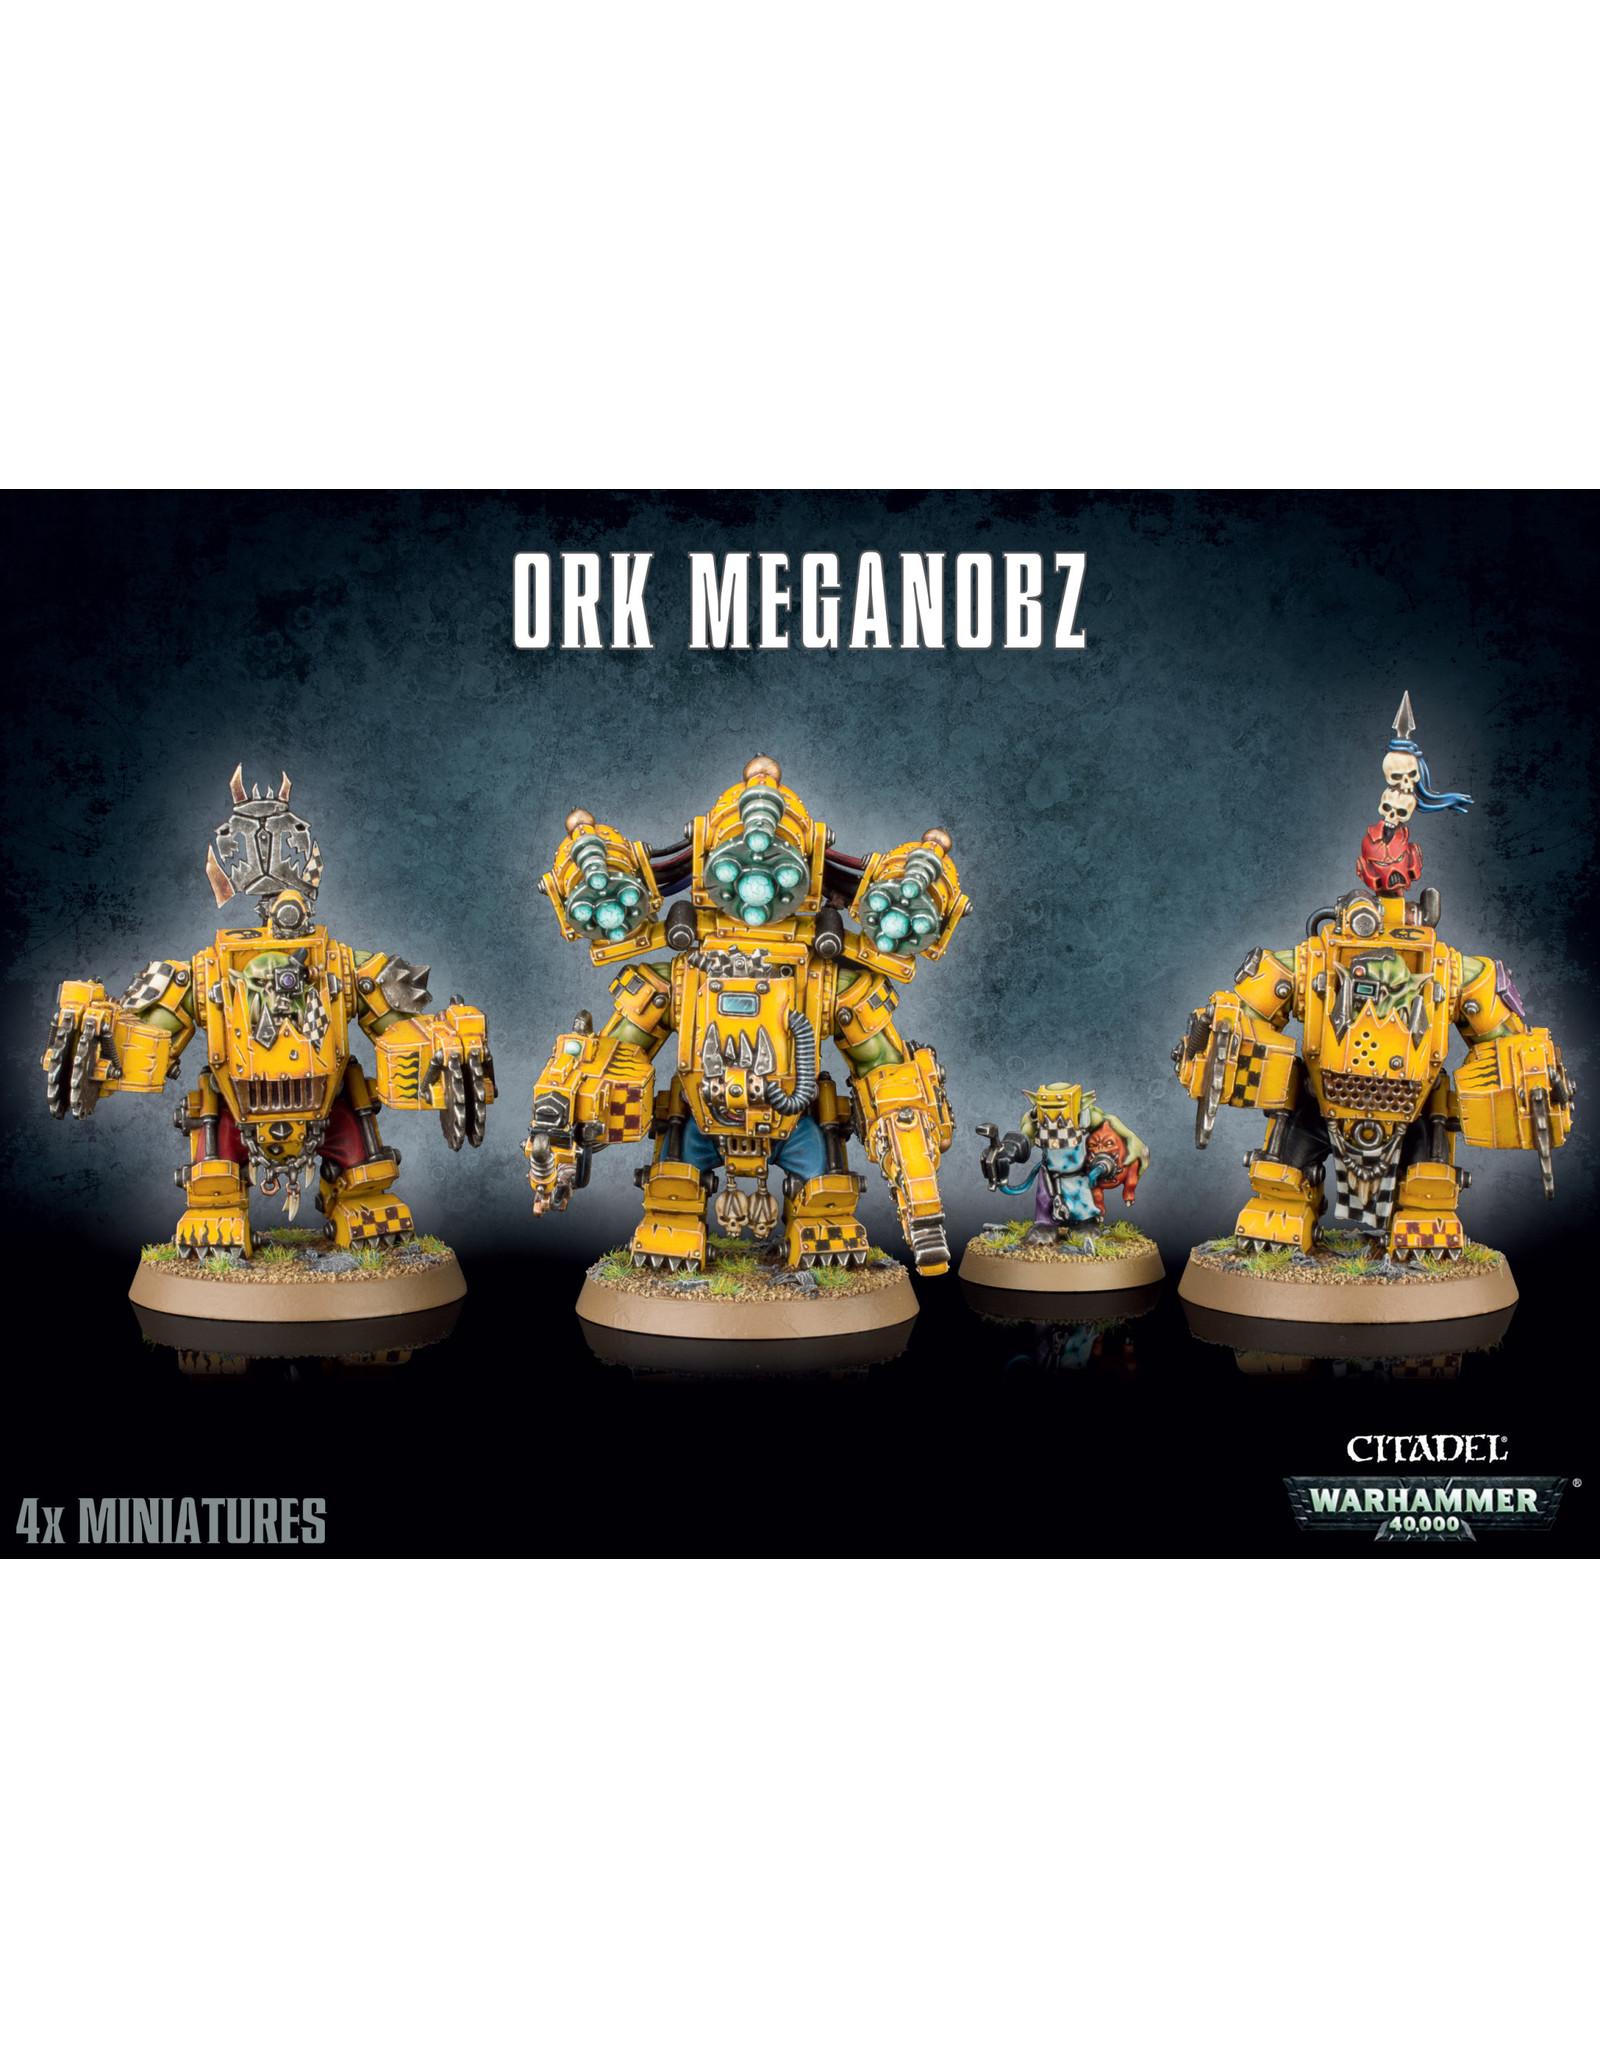 Warhammer 40,000 Ork: Meganobz